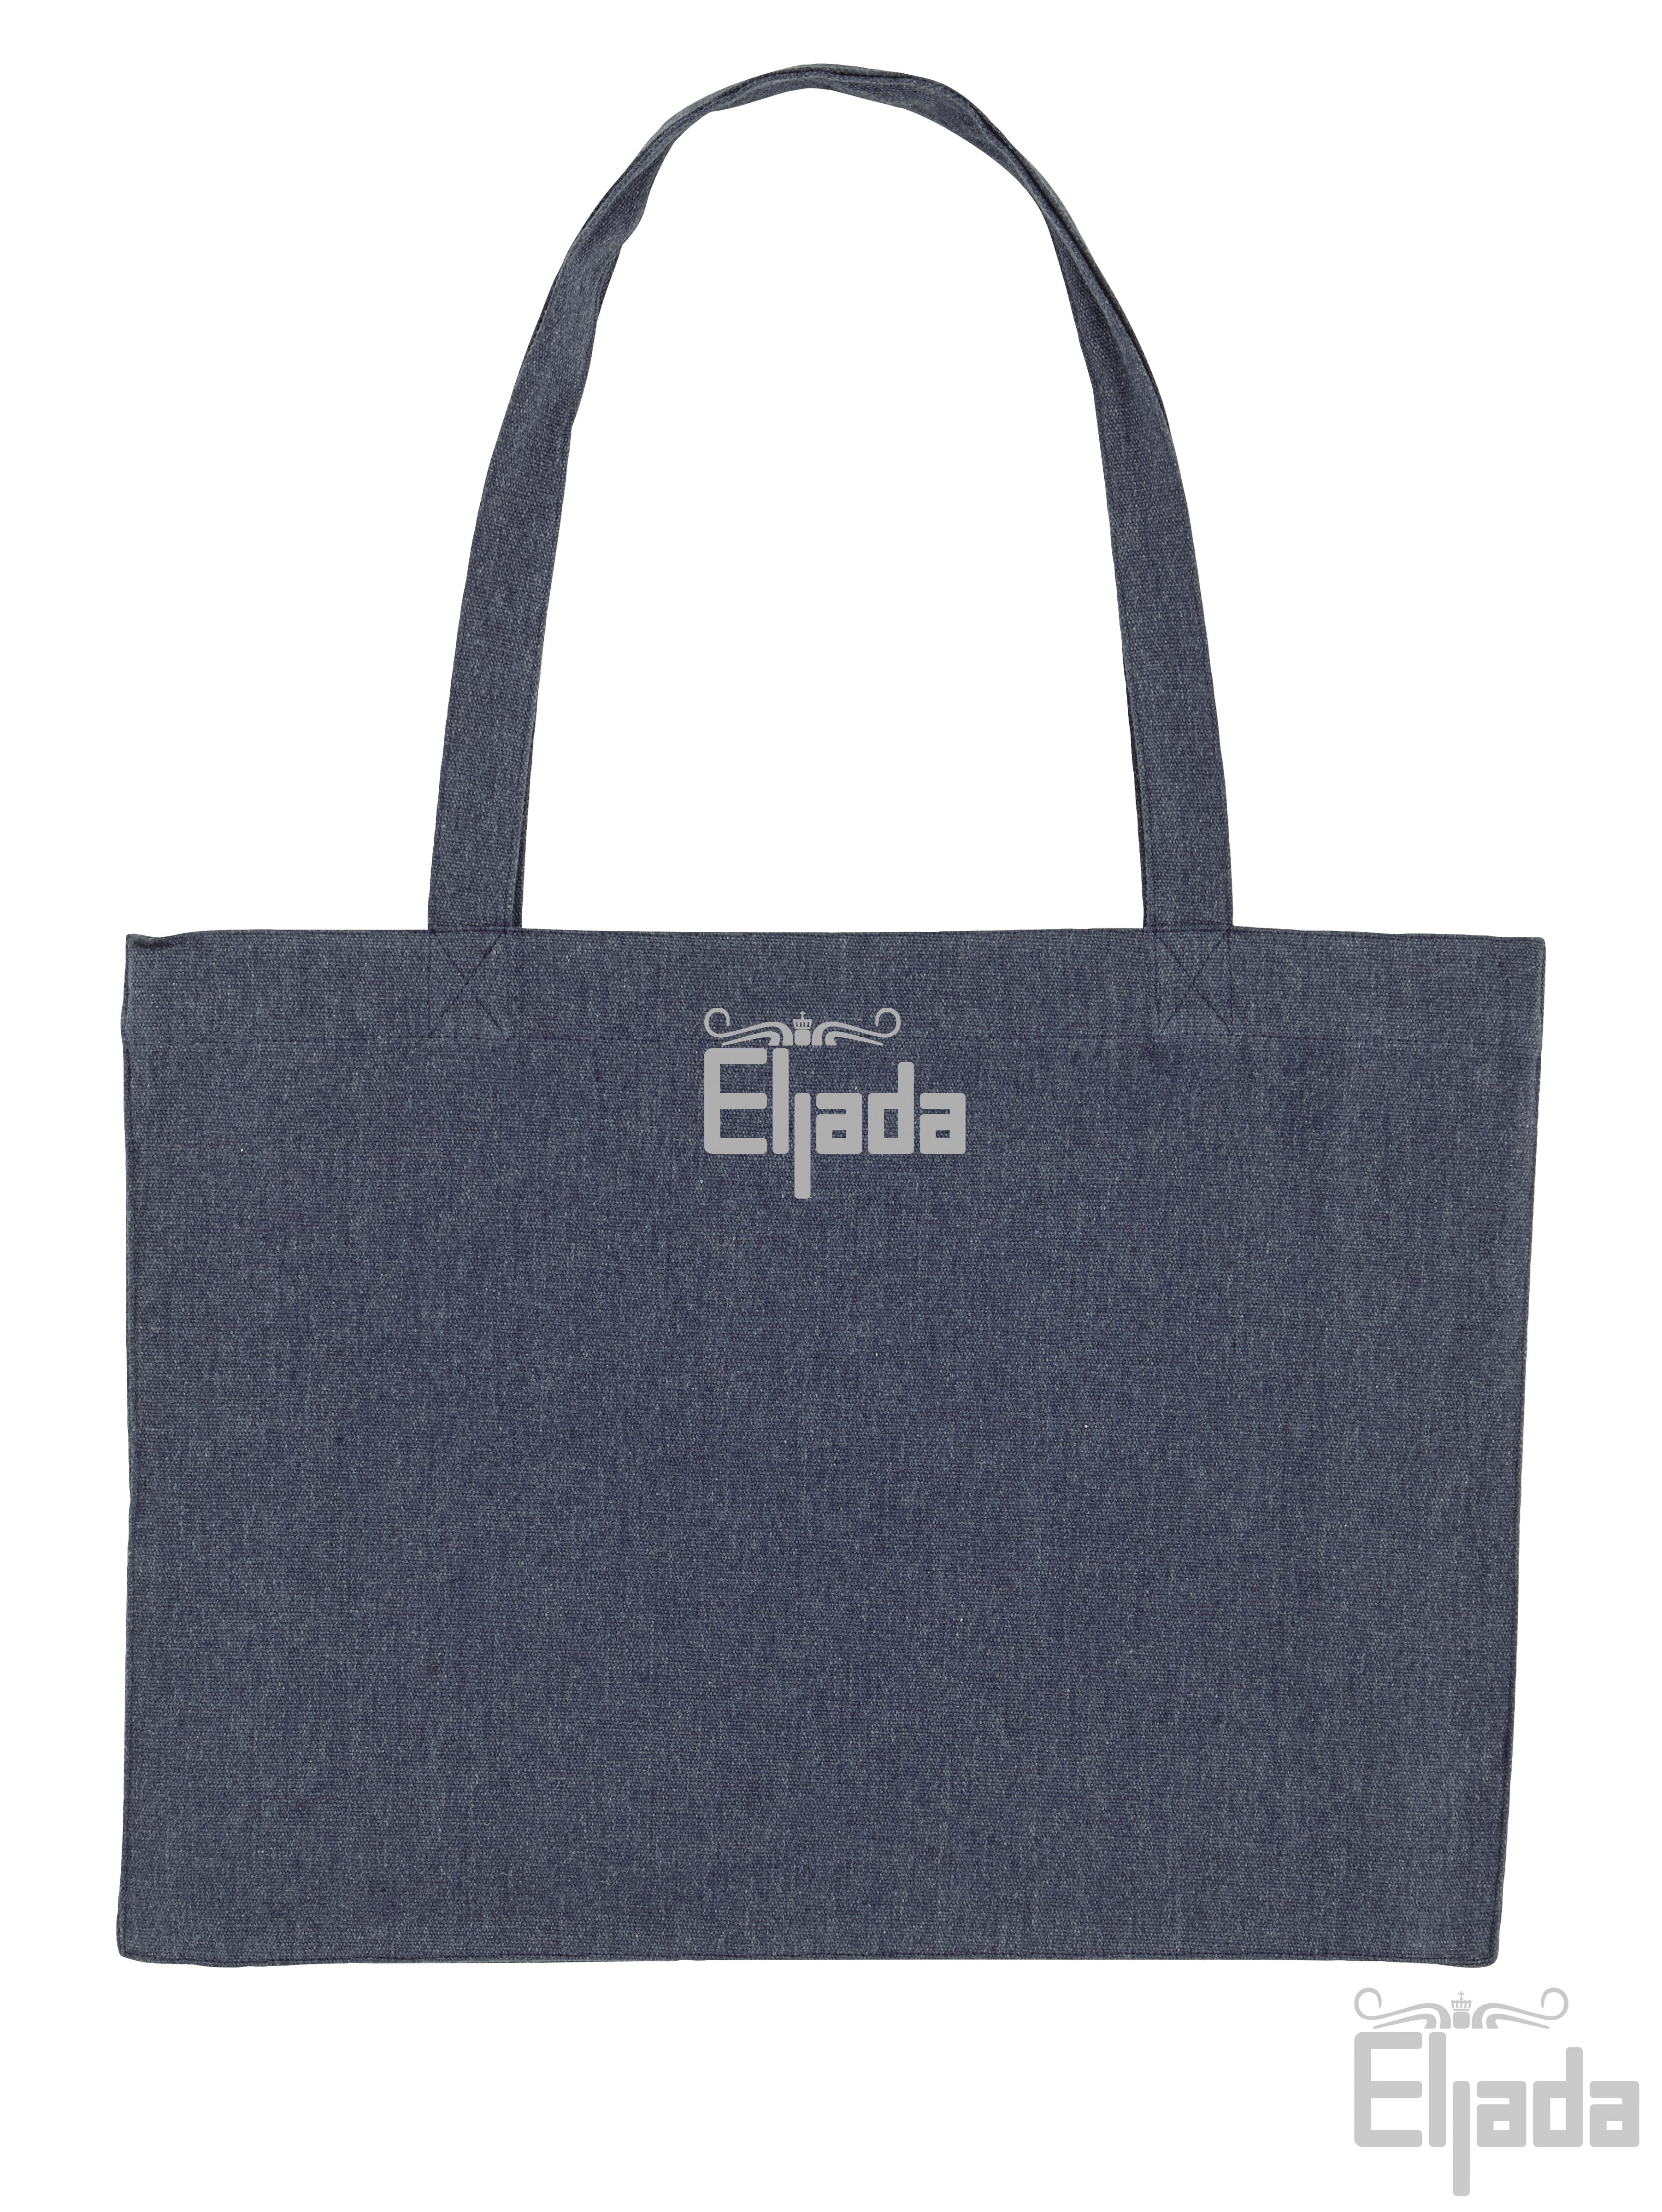 Heart bag – blue from Eljada